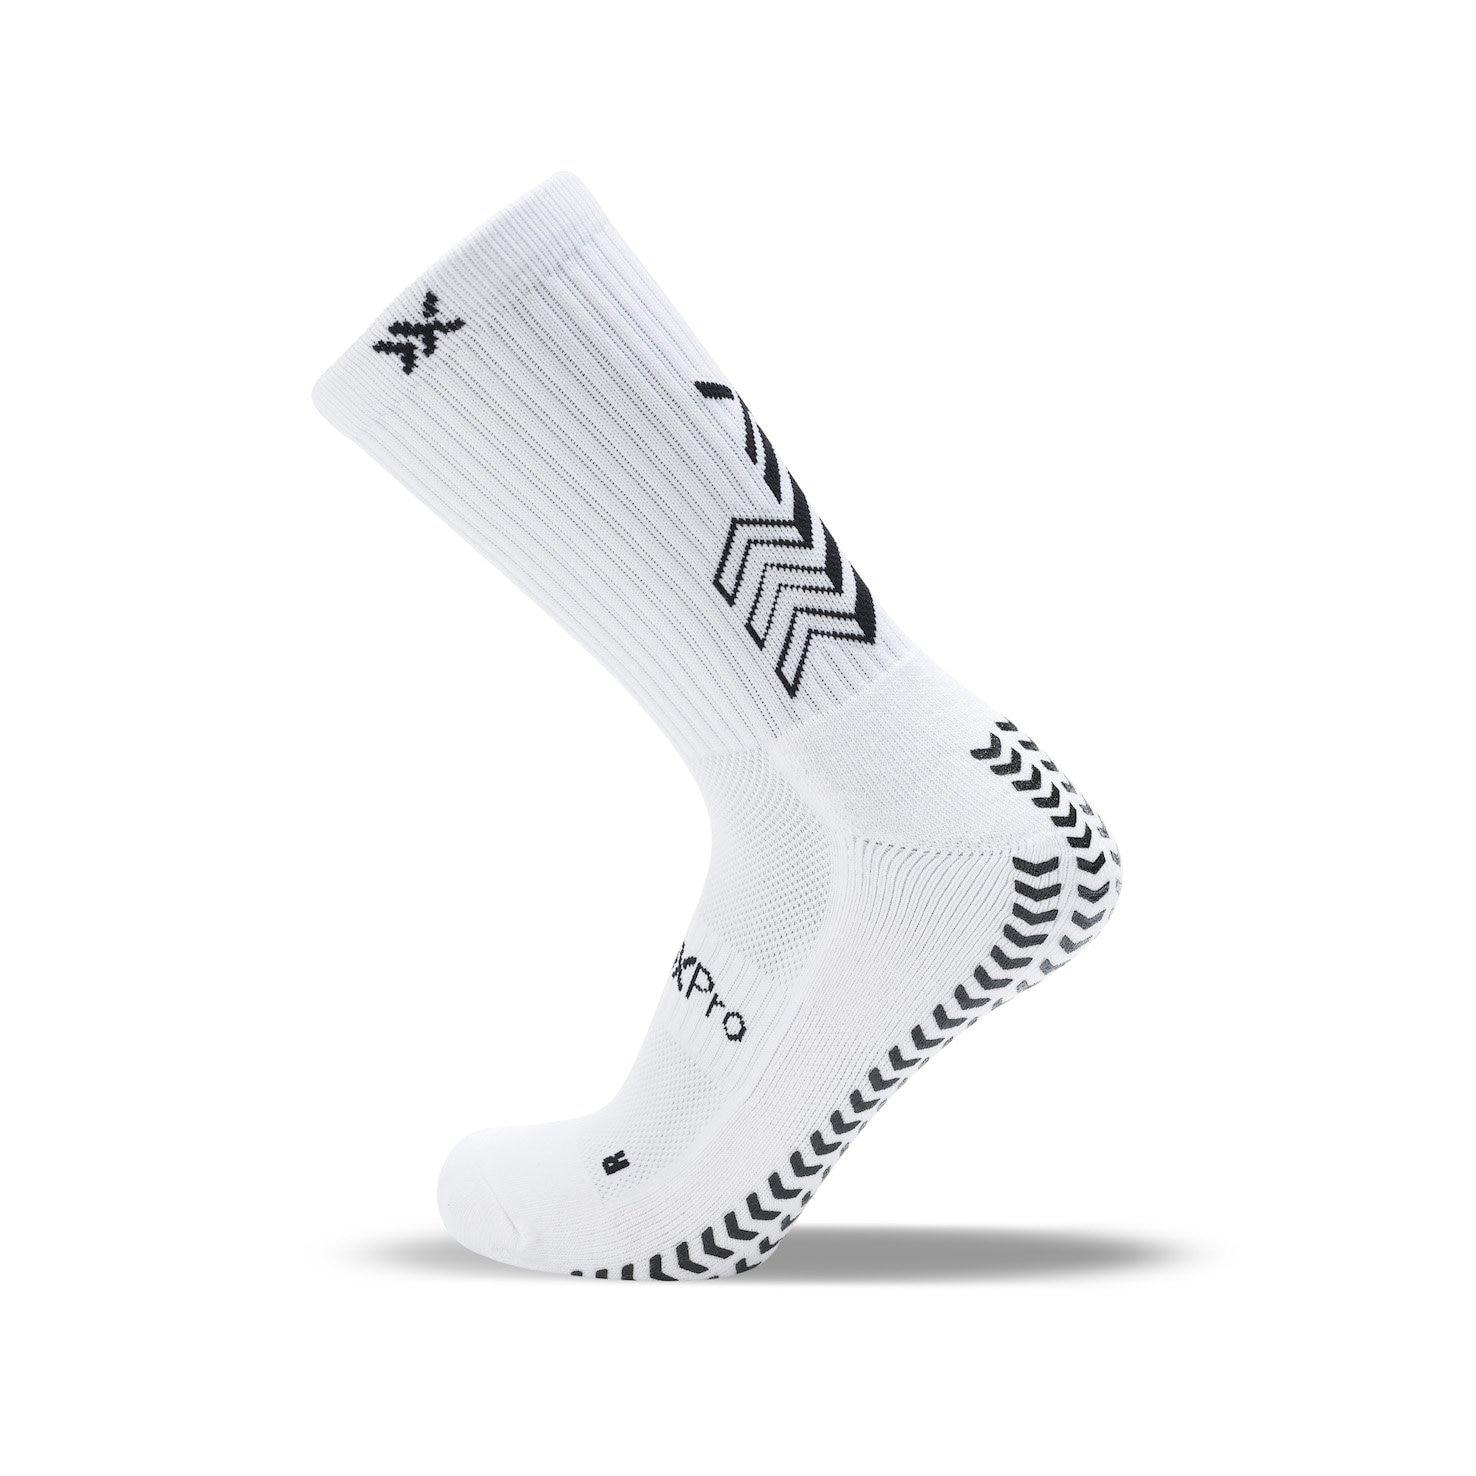 SOXPro Grip Fotballstrømper Hvit